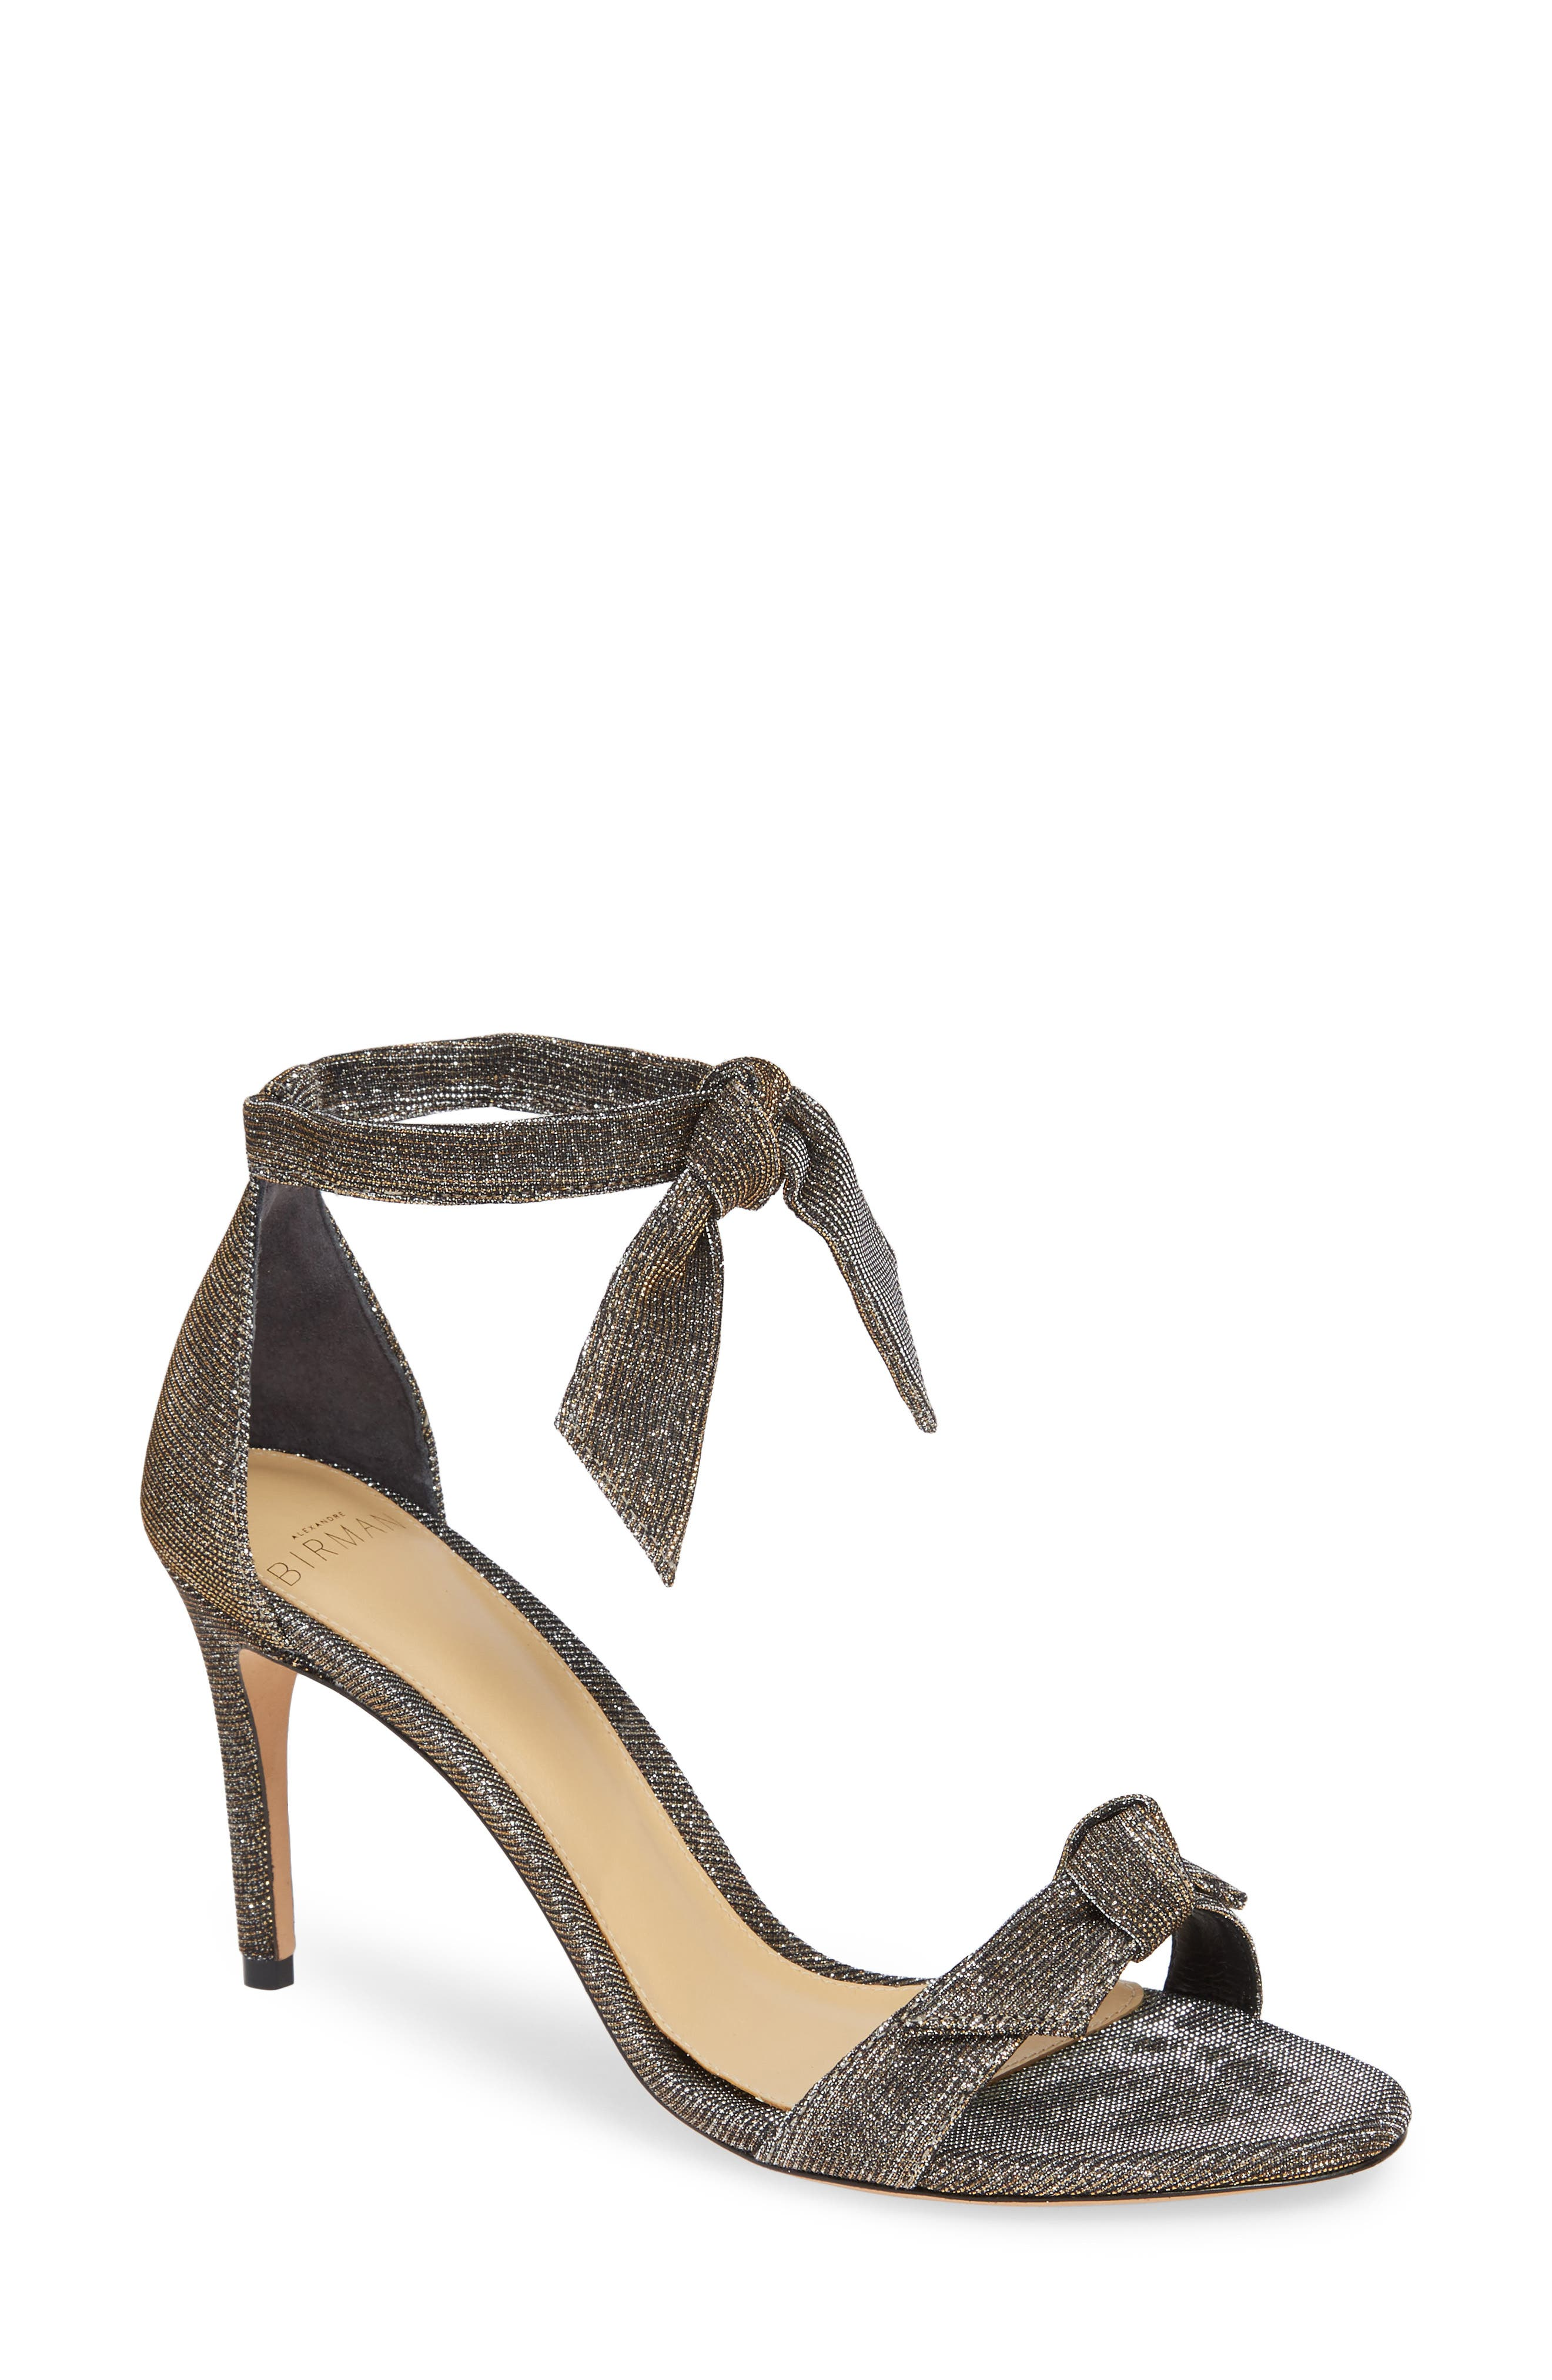 Clarita Ankle Strap Sandal,                             Main thumbnail 1, color,                             SILVER